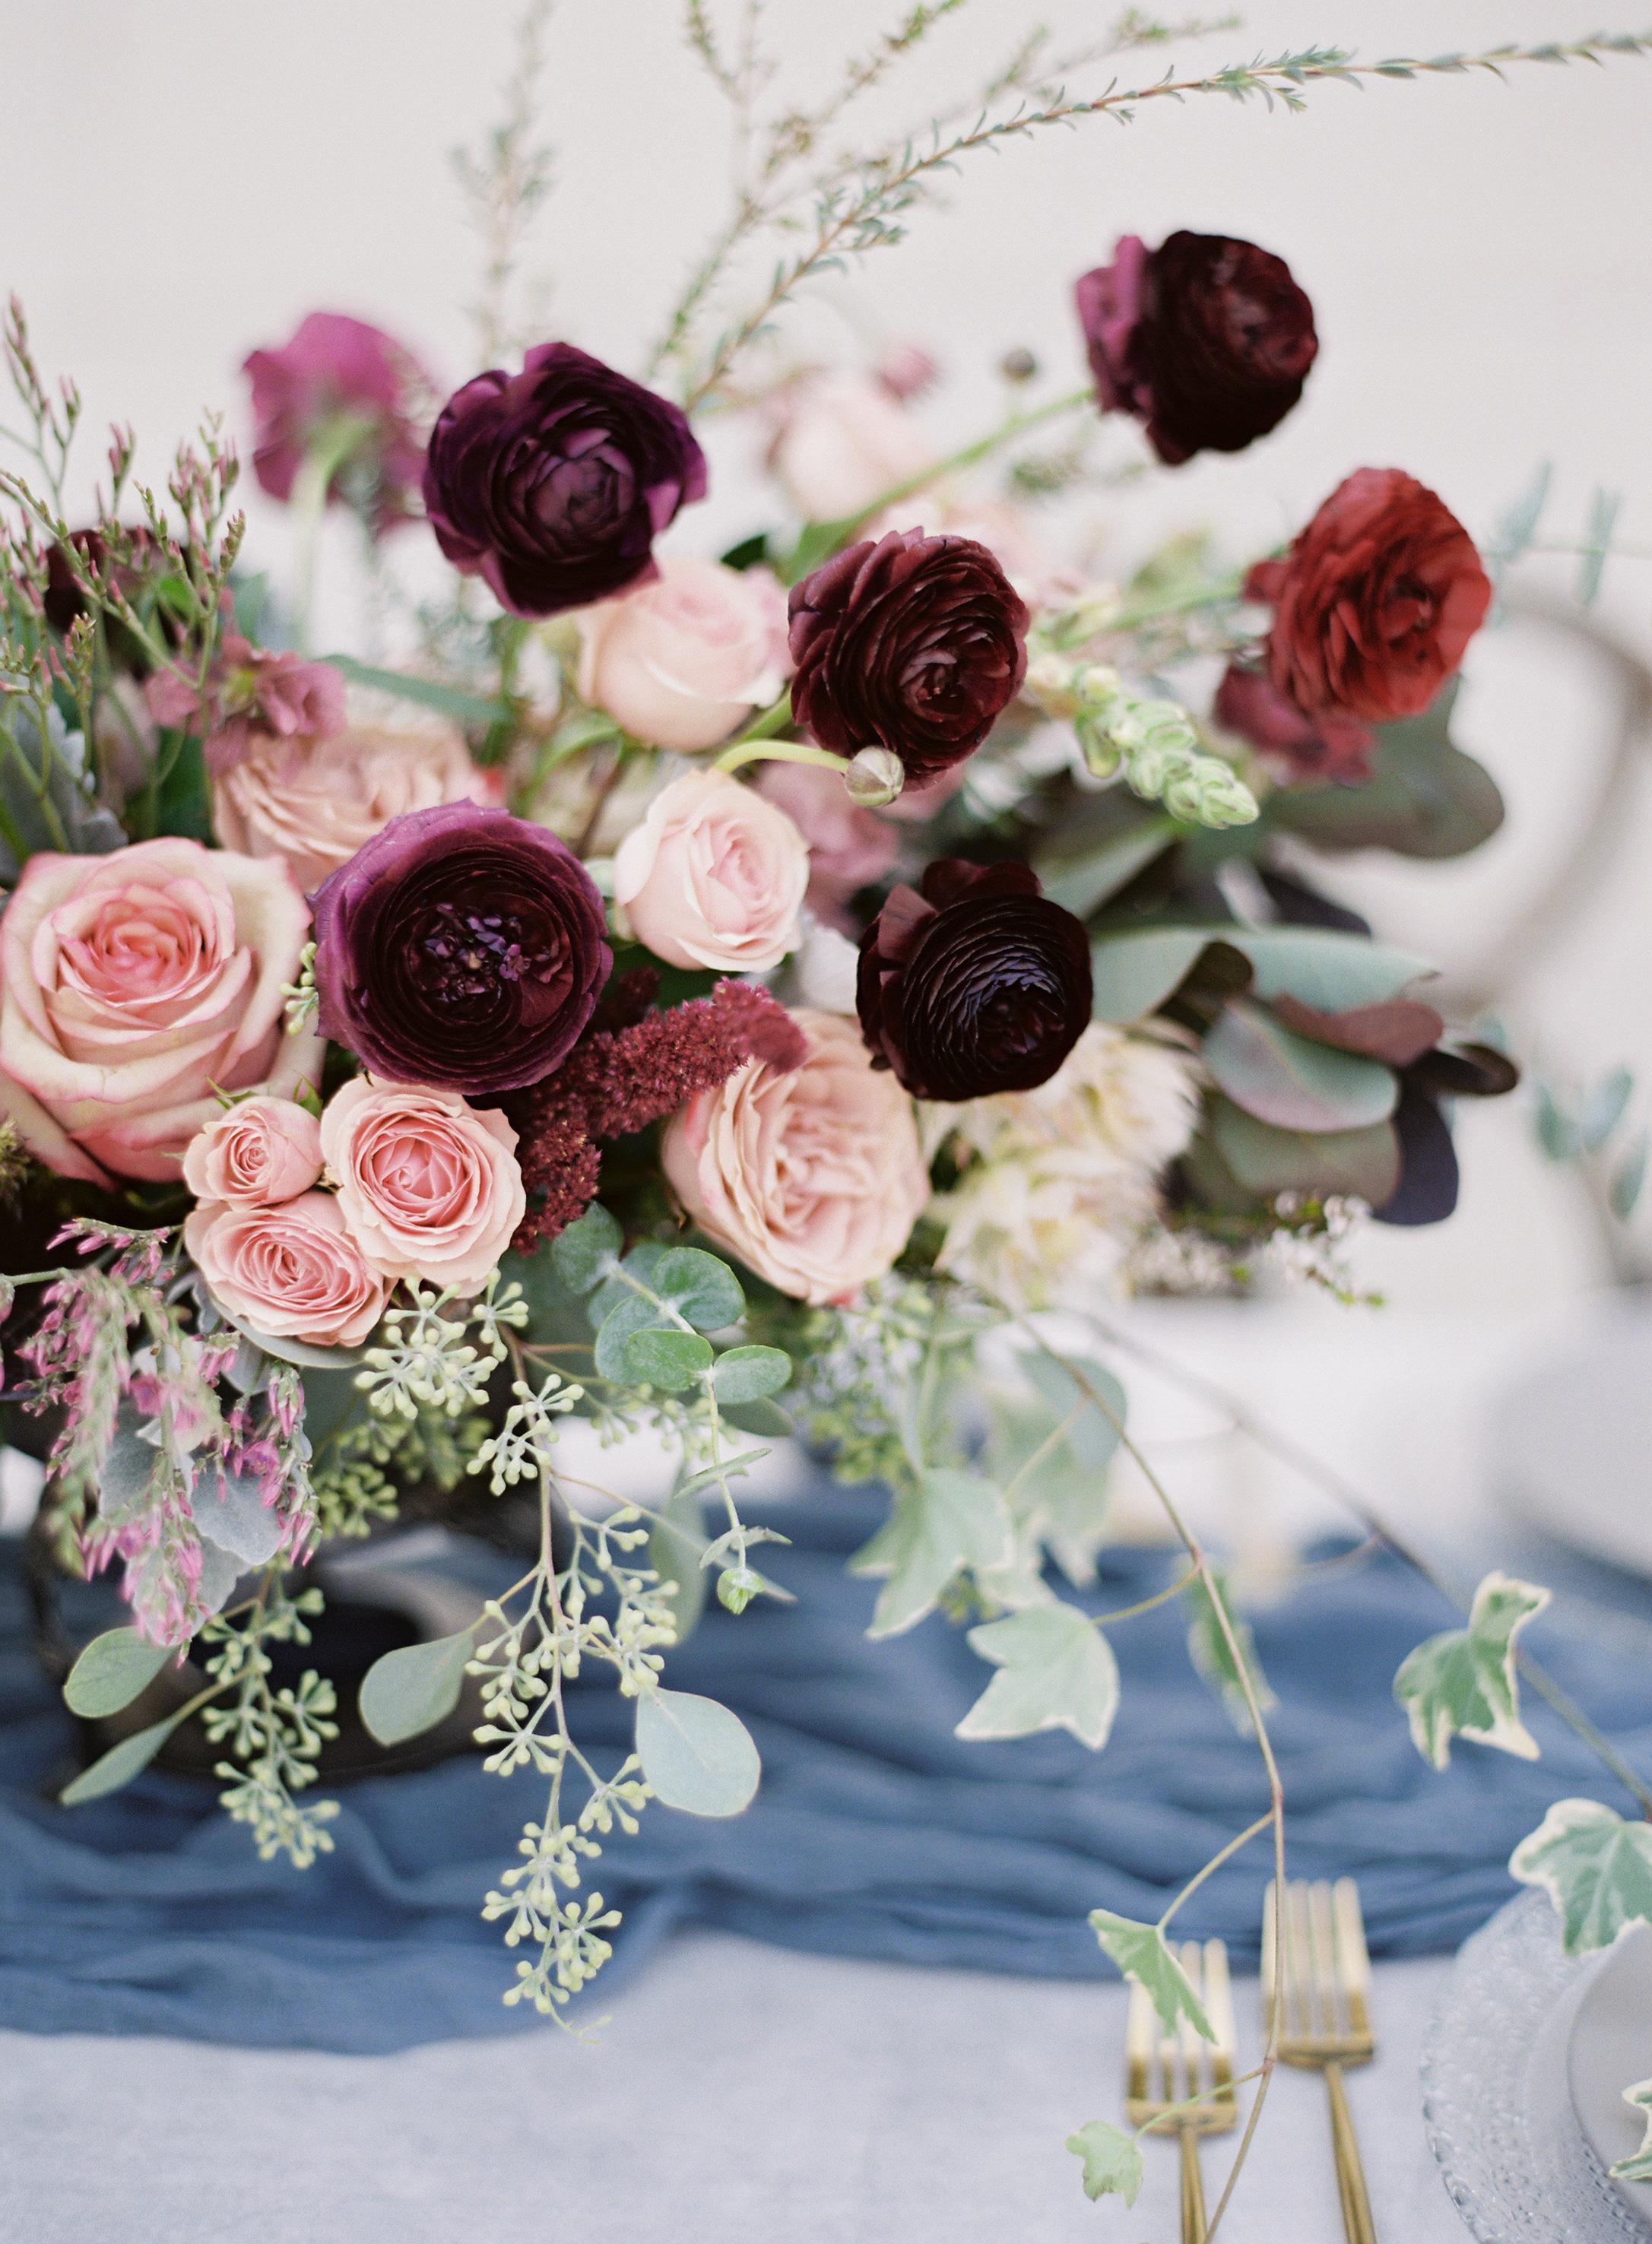 la-rue-floral-denver-wedding-florist-fall-wedding.jpg